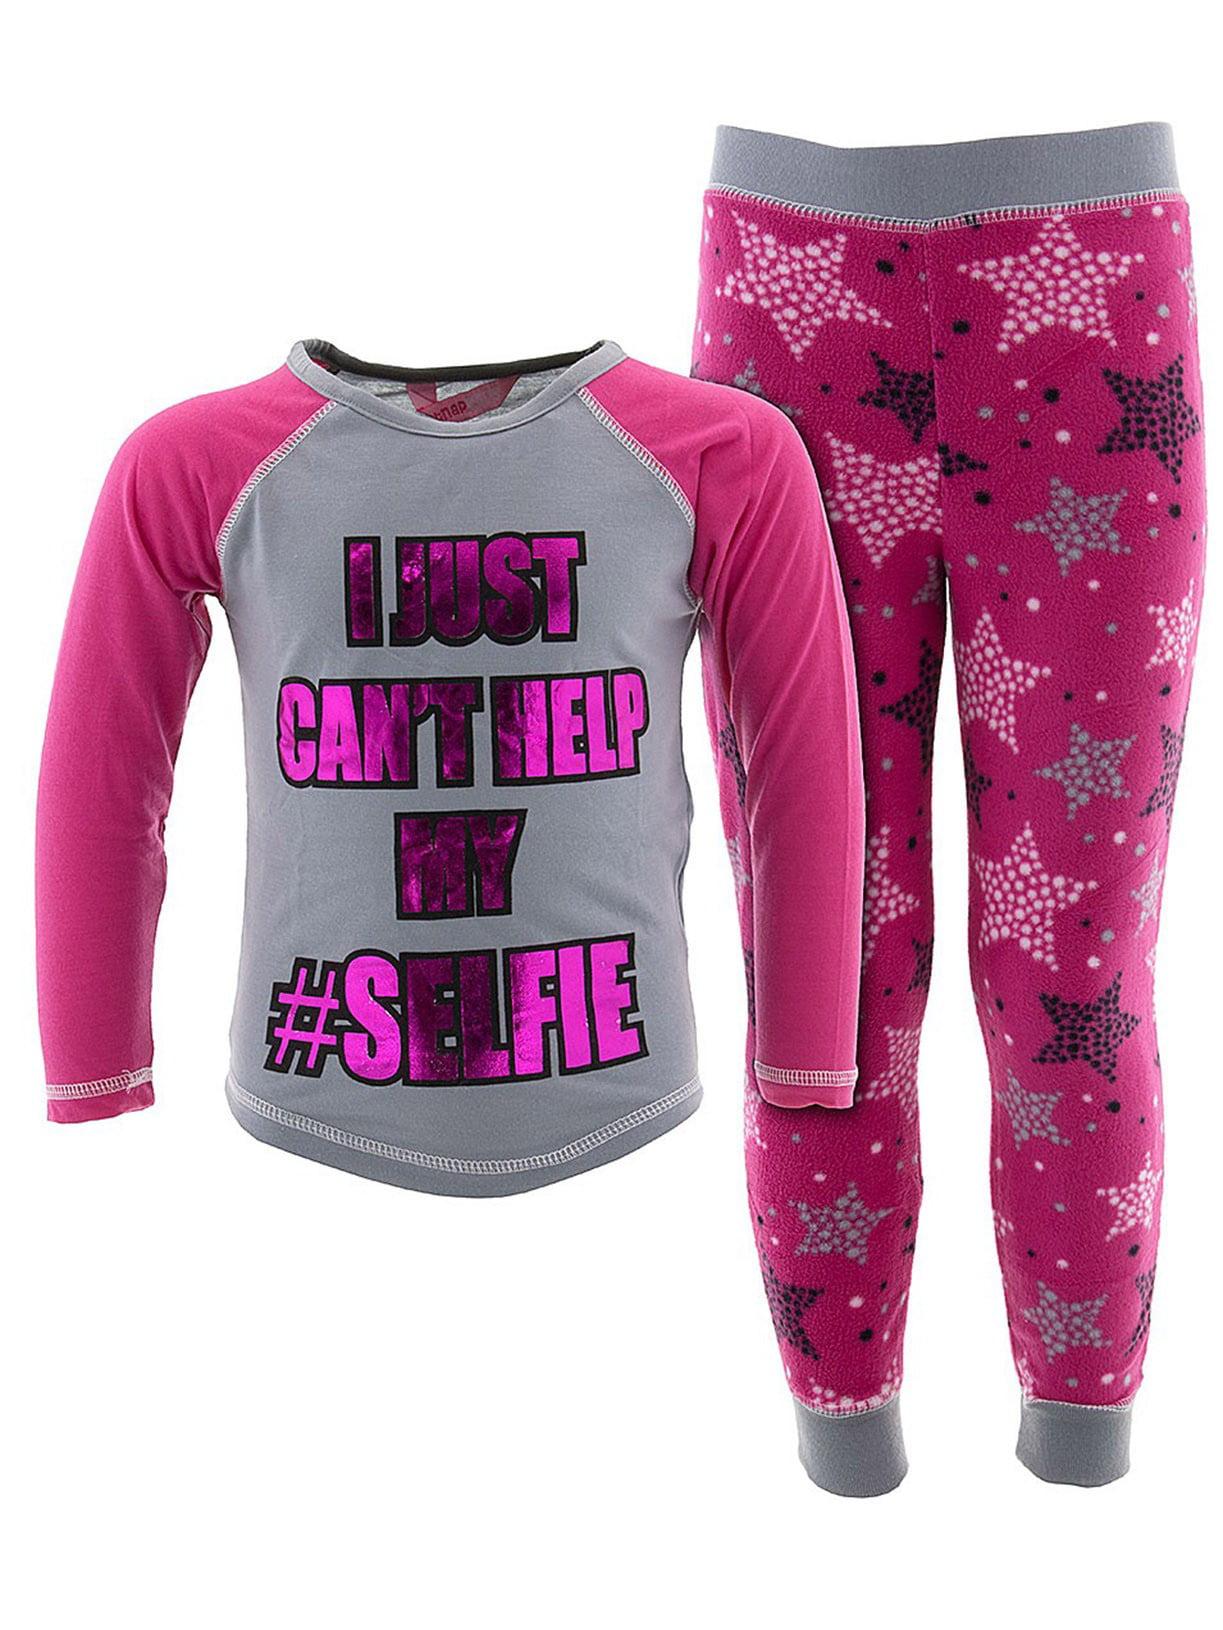 Katnap Kids' Girls Can't Help My Selfie Gray Pajamas